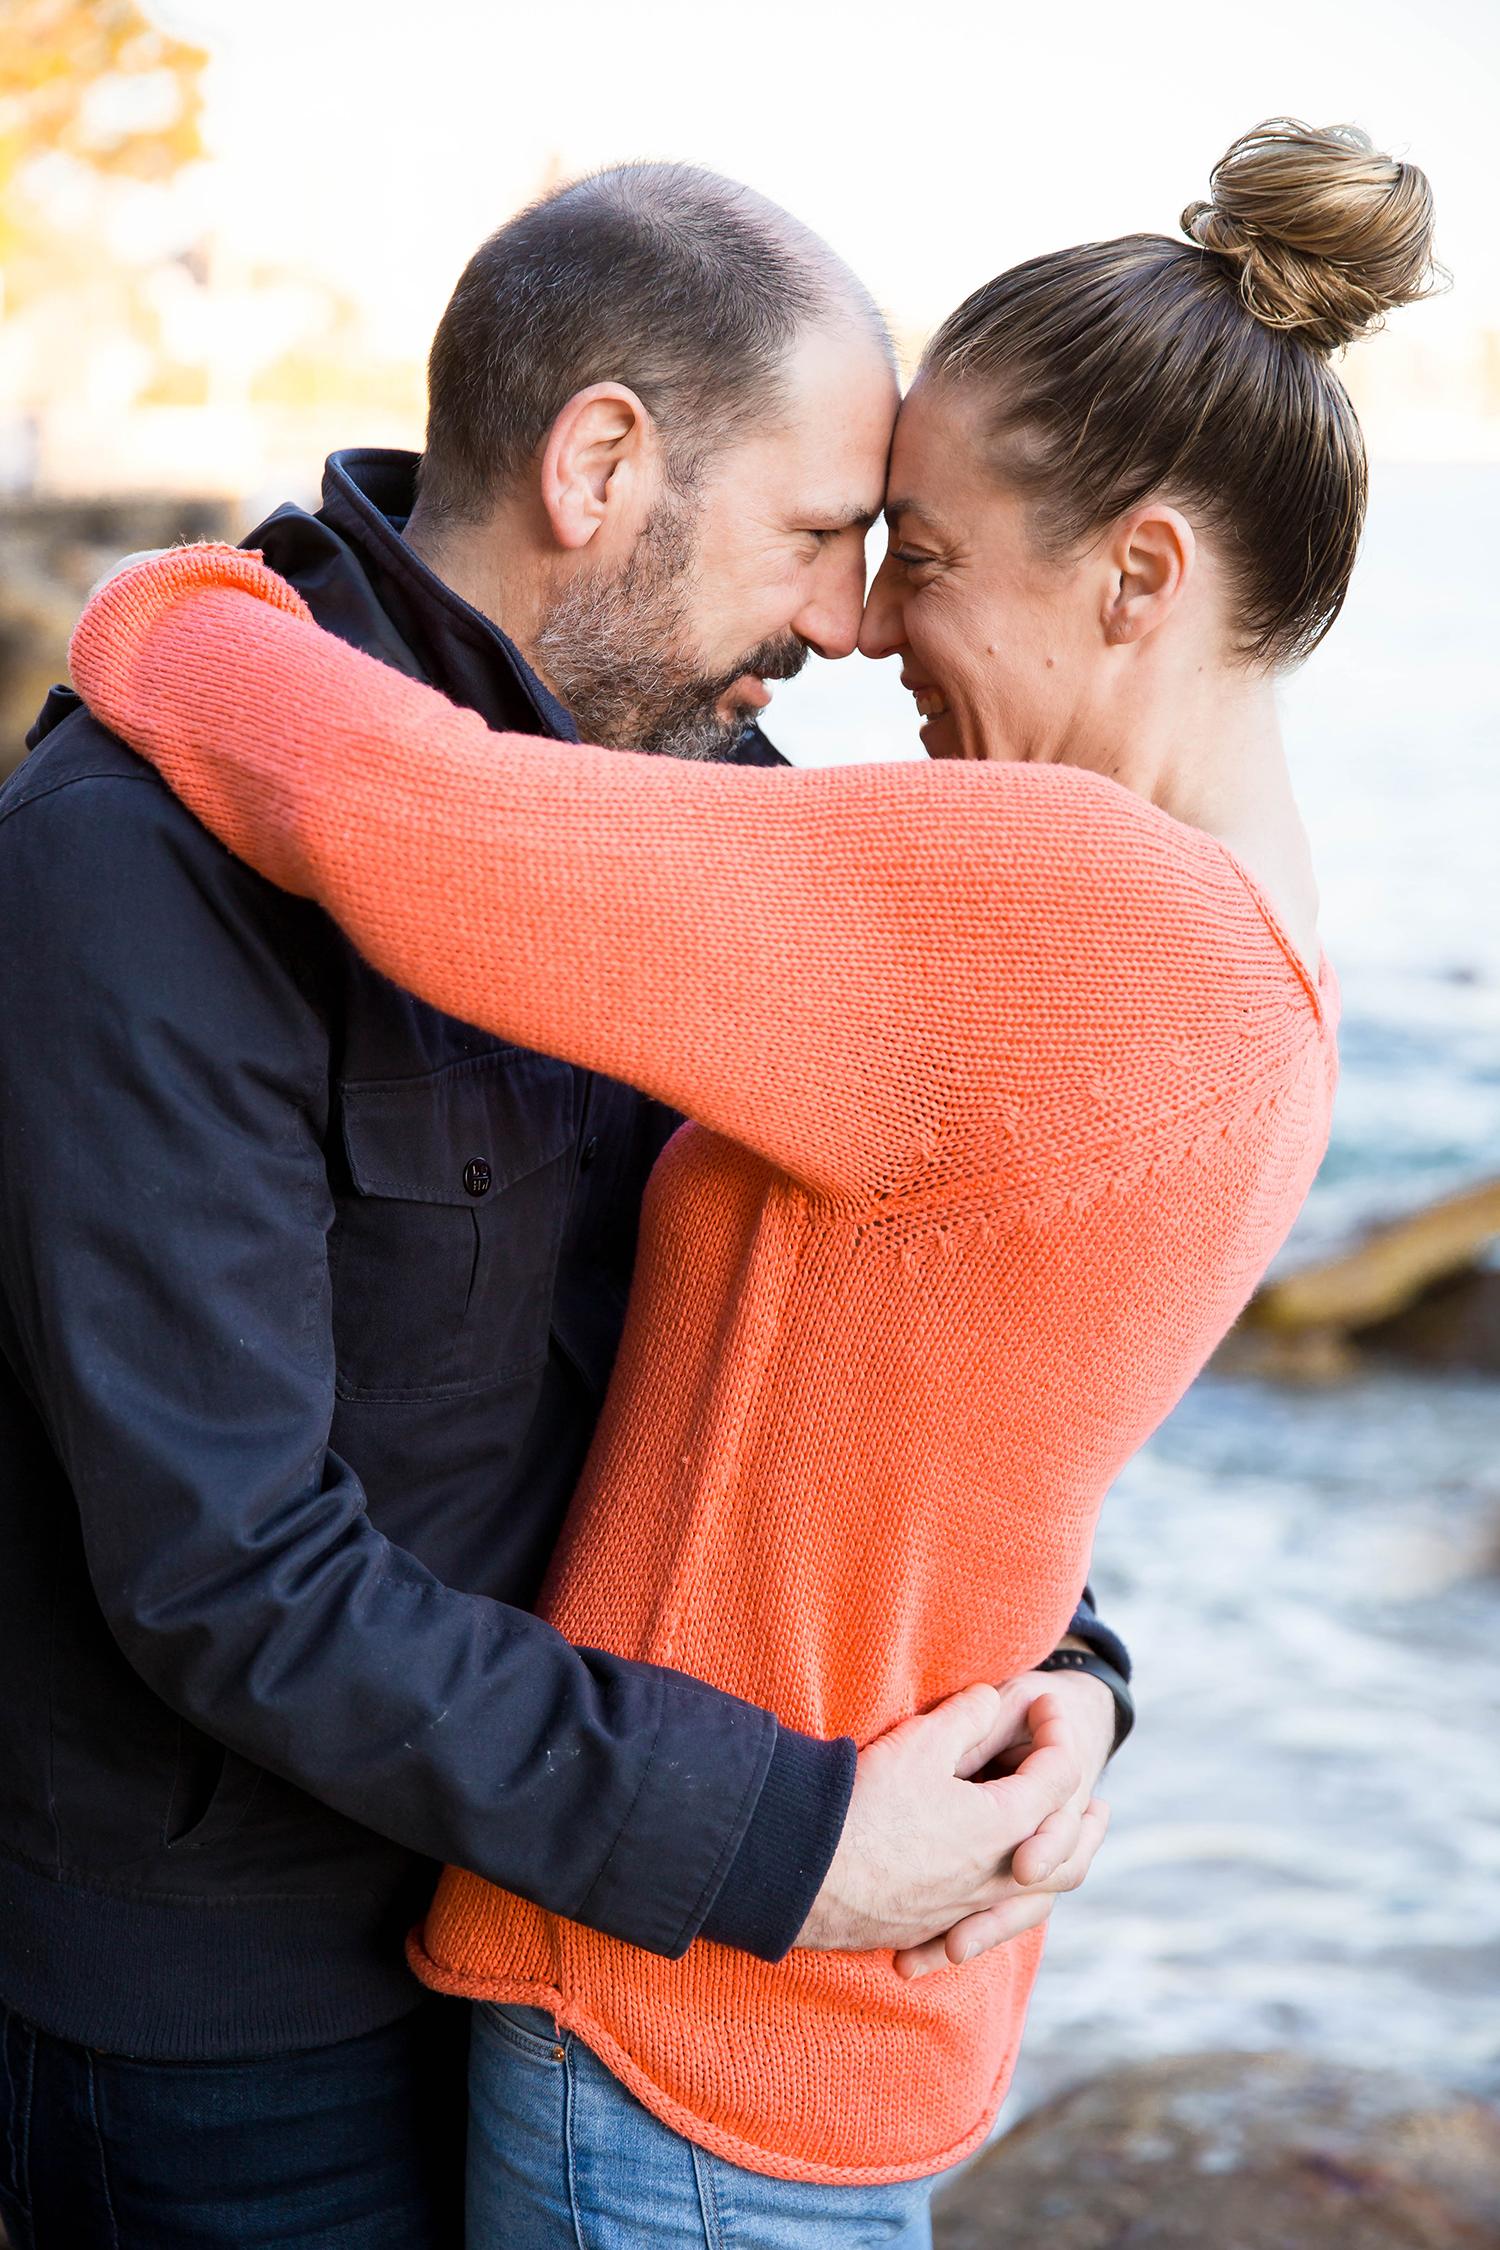 Sydney Pre-Wedding Photo Session - Shelly Beach Manly - Jennifer Lam Photography (1).jpg